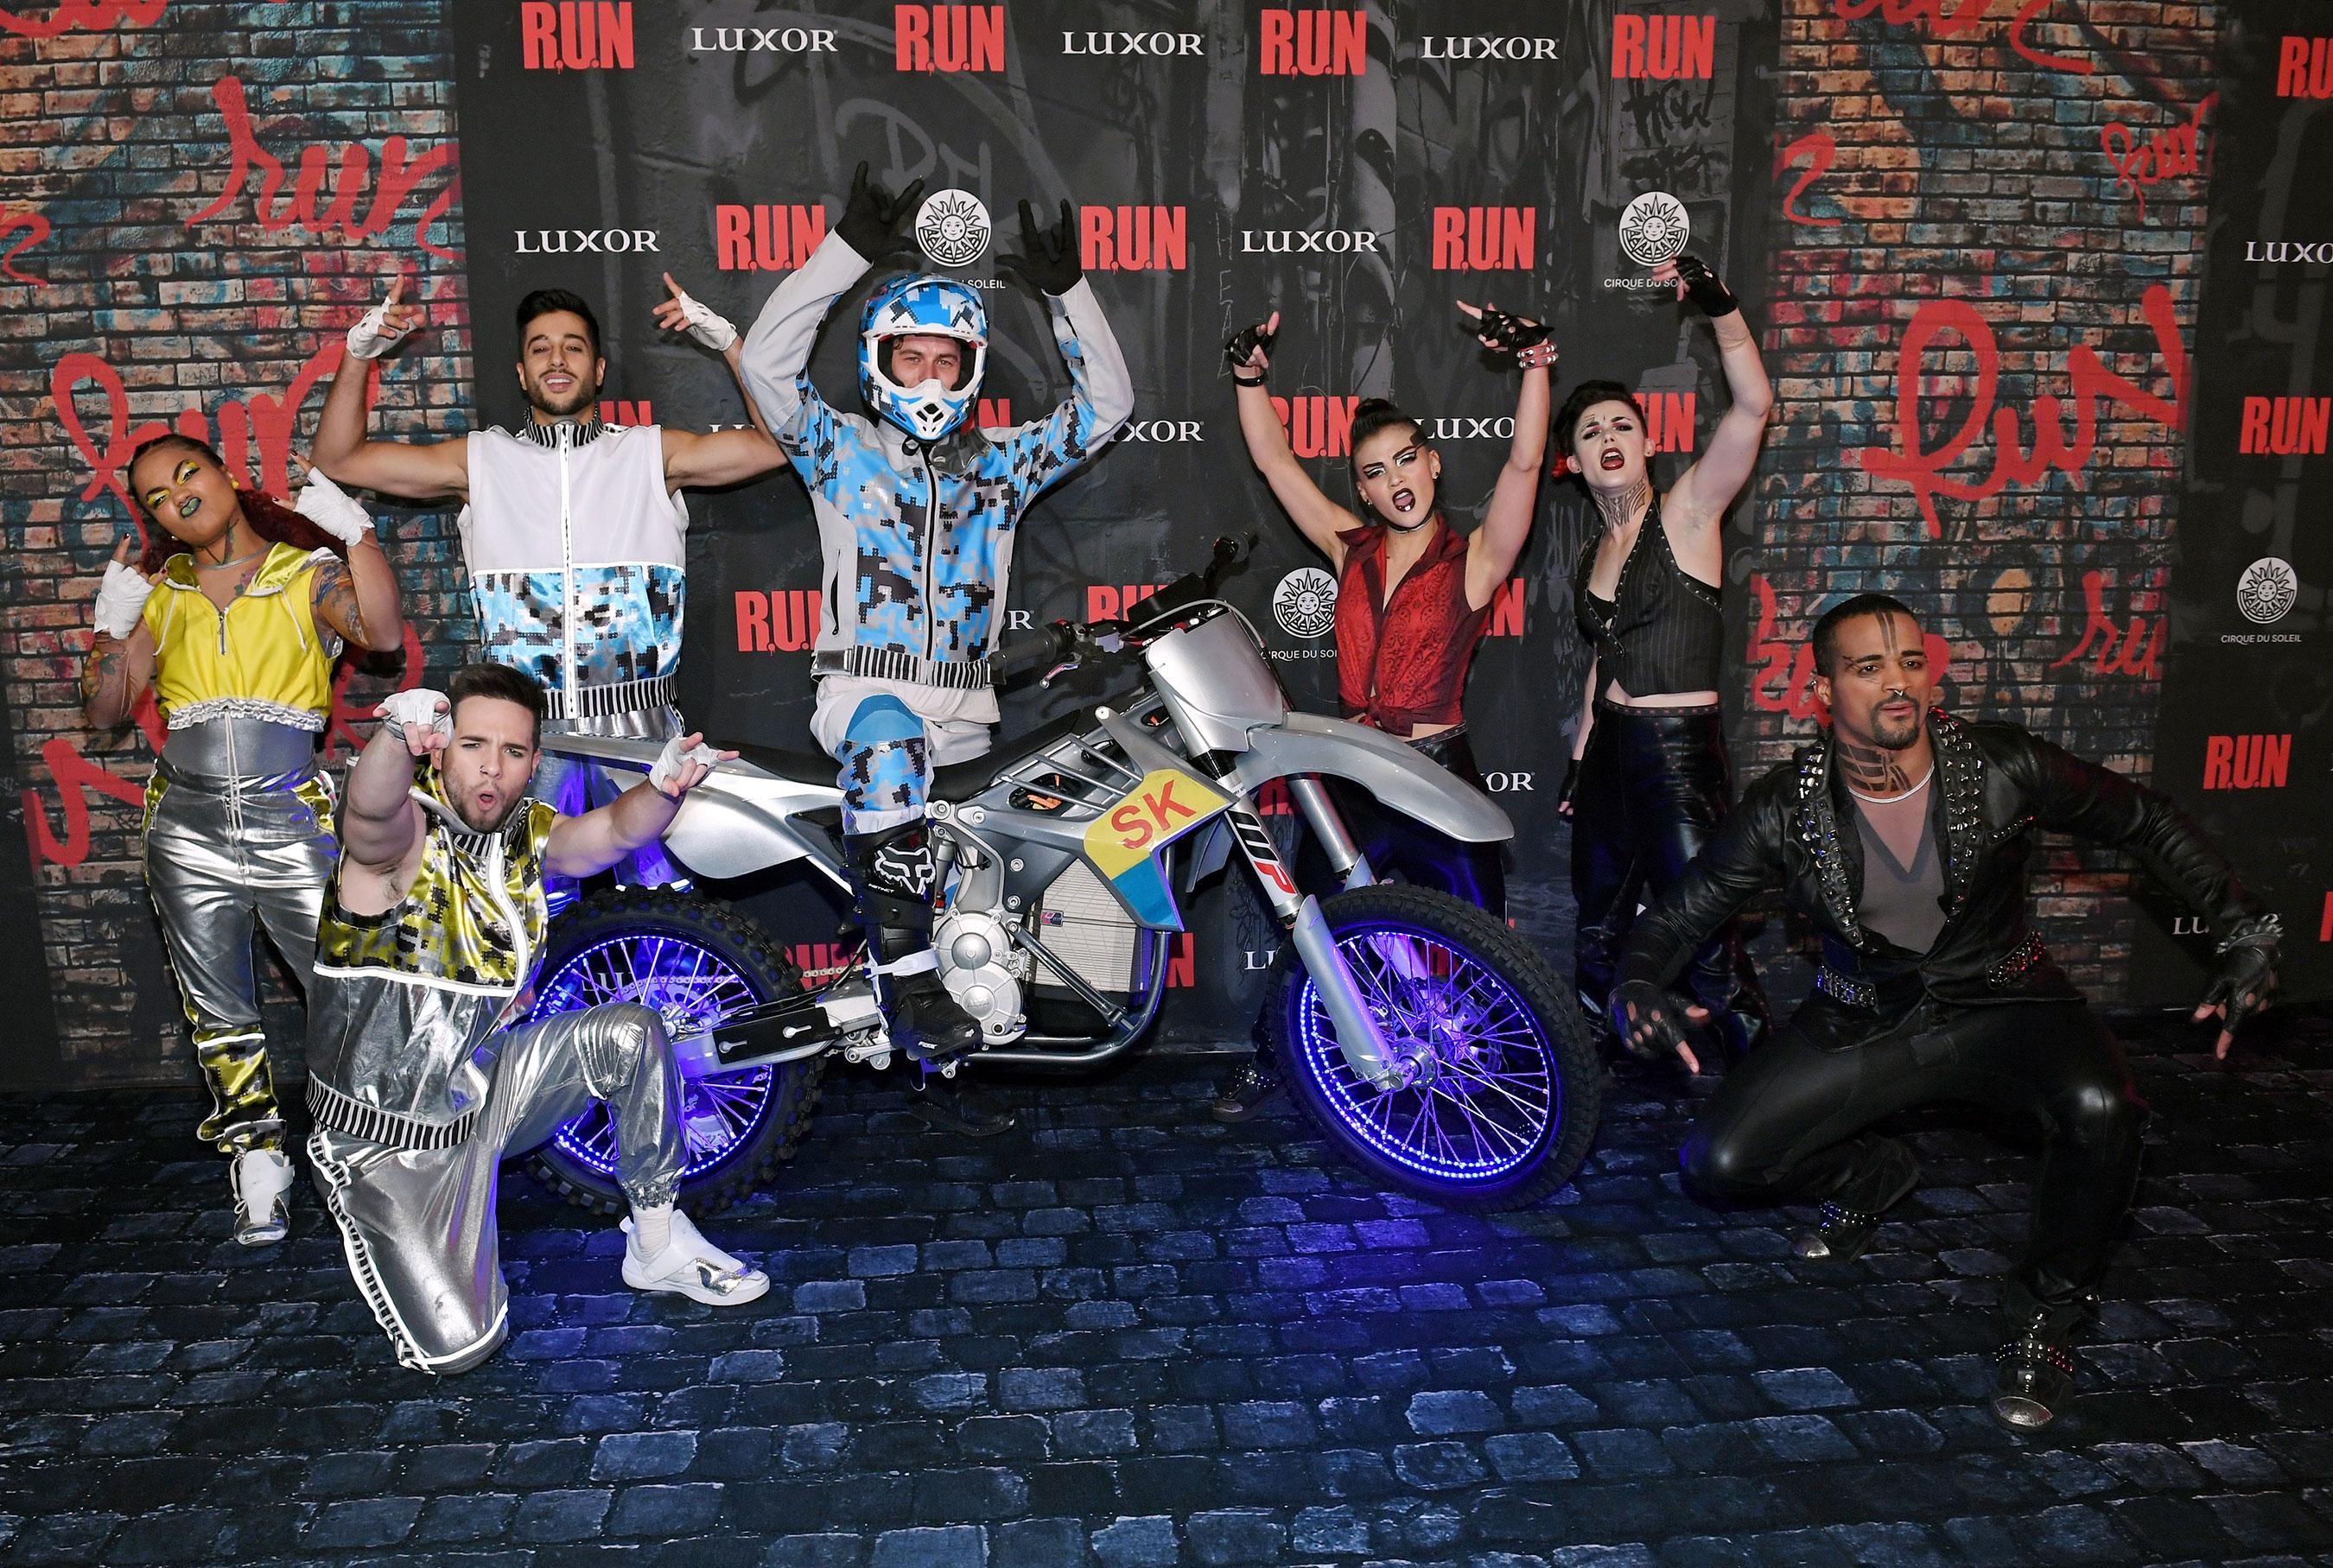 Cast of R.U.N Poses on Red Carpet at World Premiere, Nov. 14